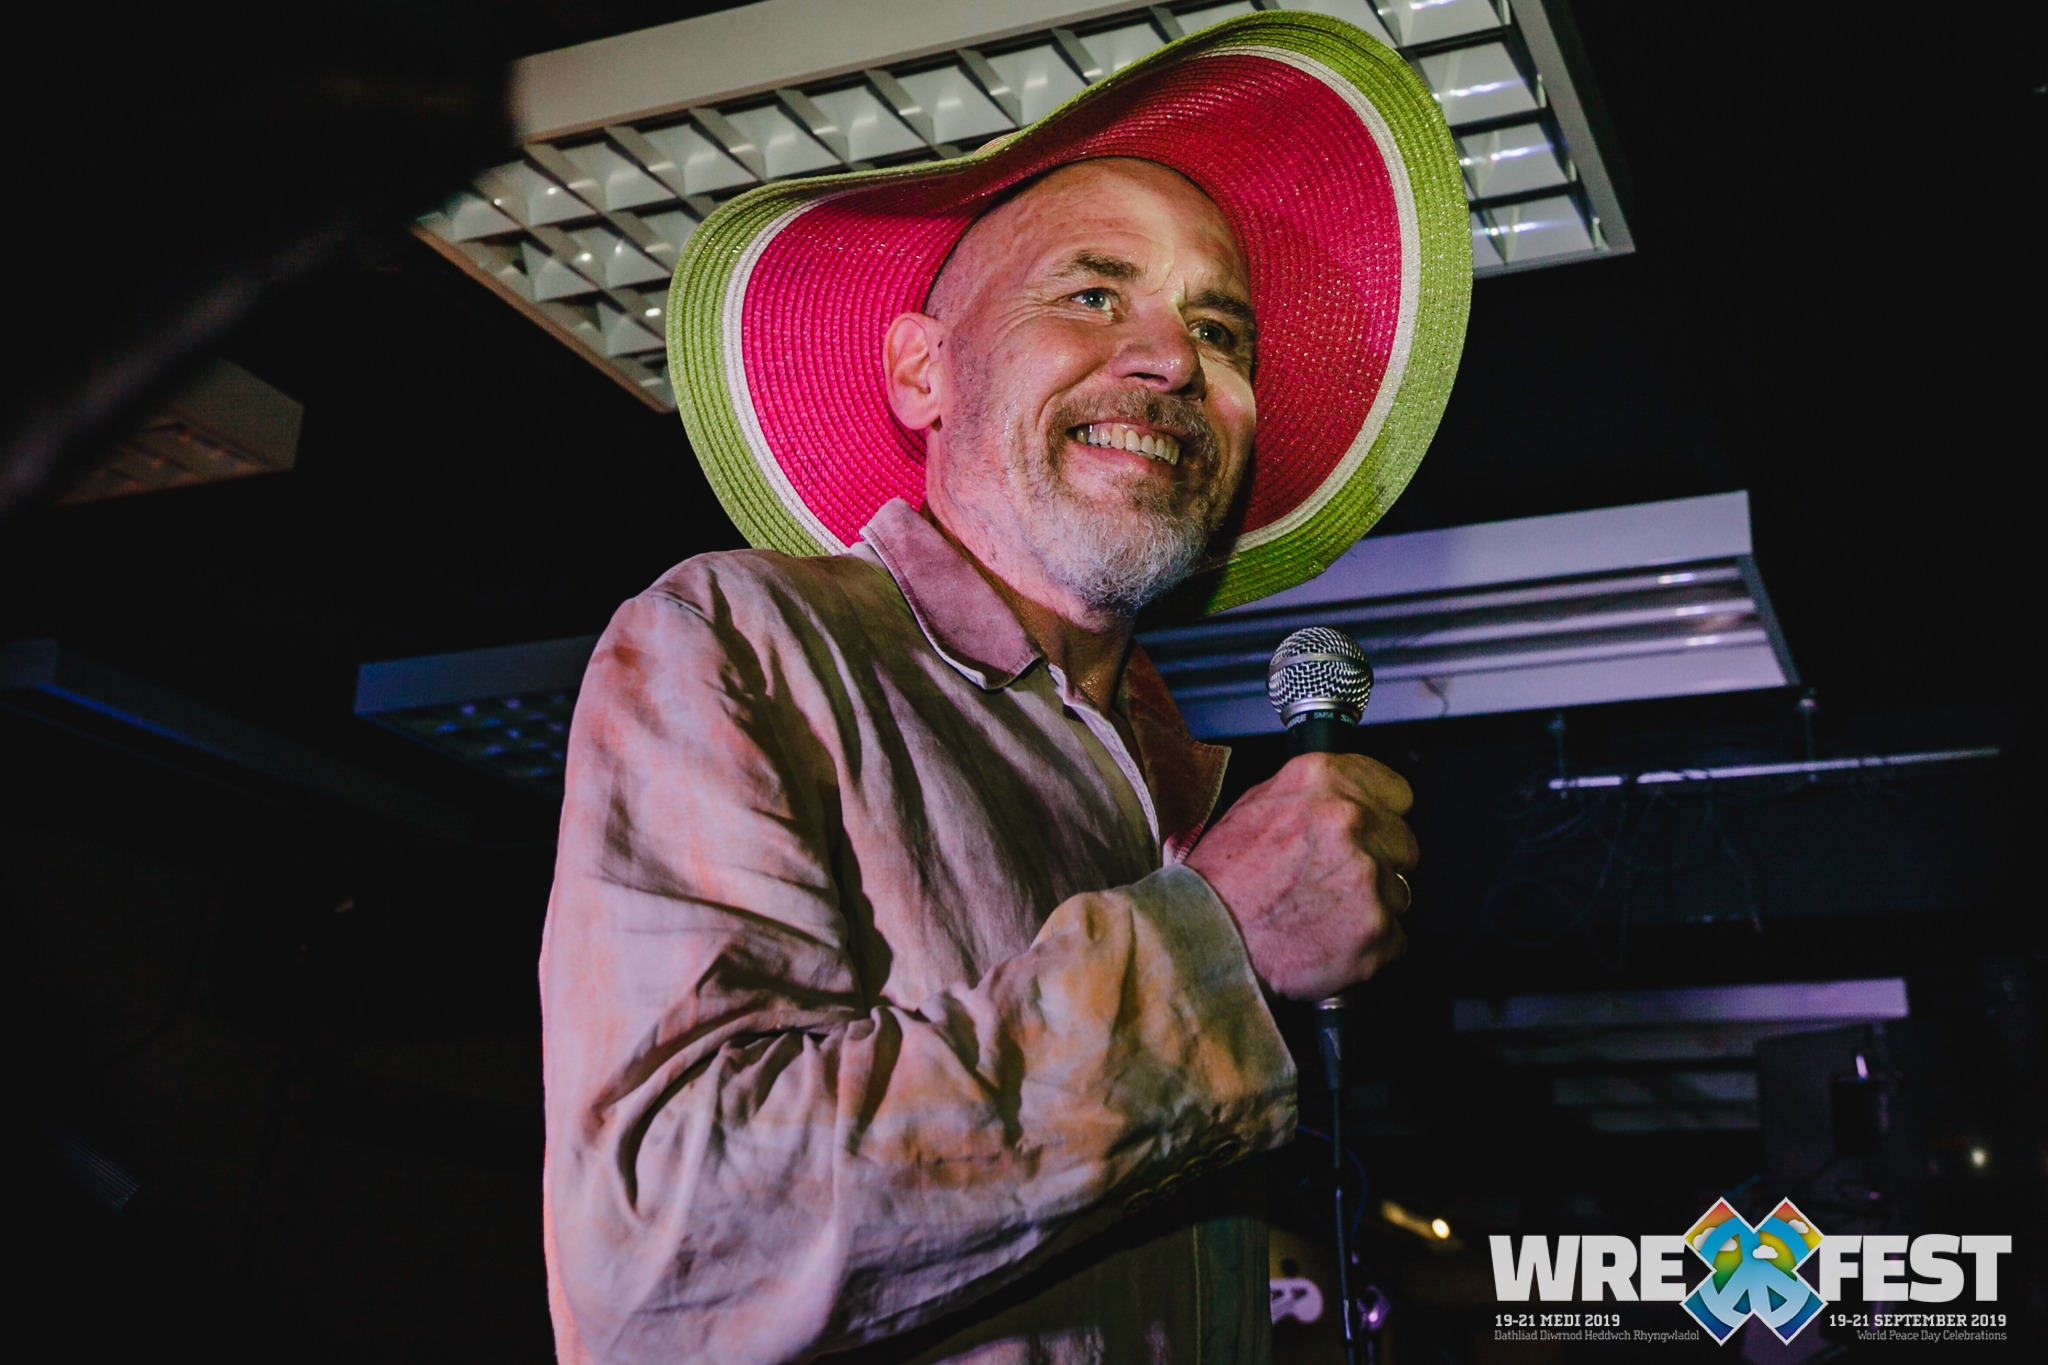 Wrexfest – World Peace Day Celebrations, Undegun Arts Space, Wrexham 21st September 2019